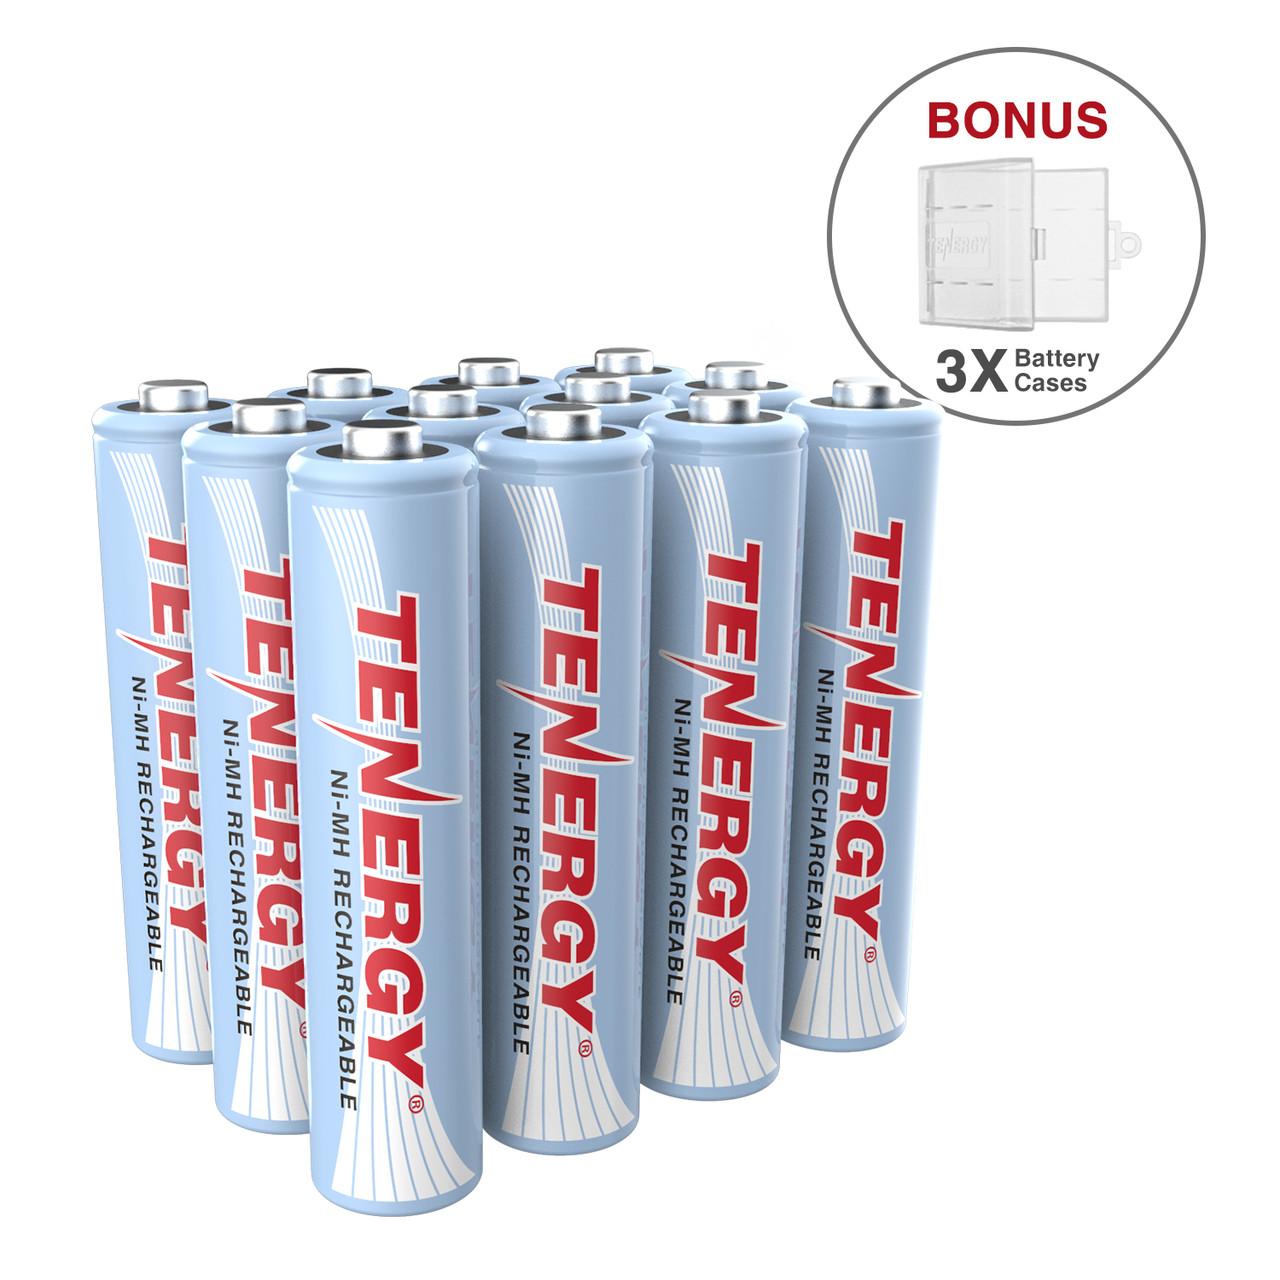 12 pcs Tenergy AAA 1000mAh NiMH Rechargeable Batteries + 3 AAA Size Holders